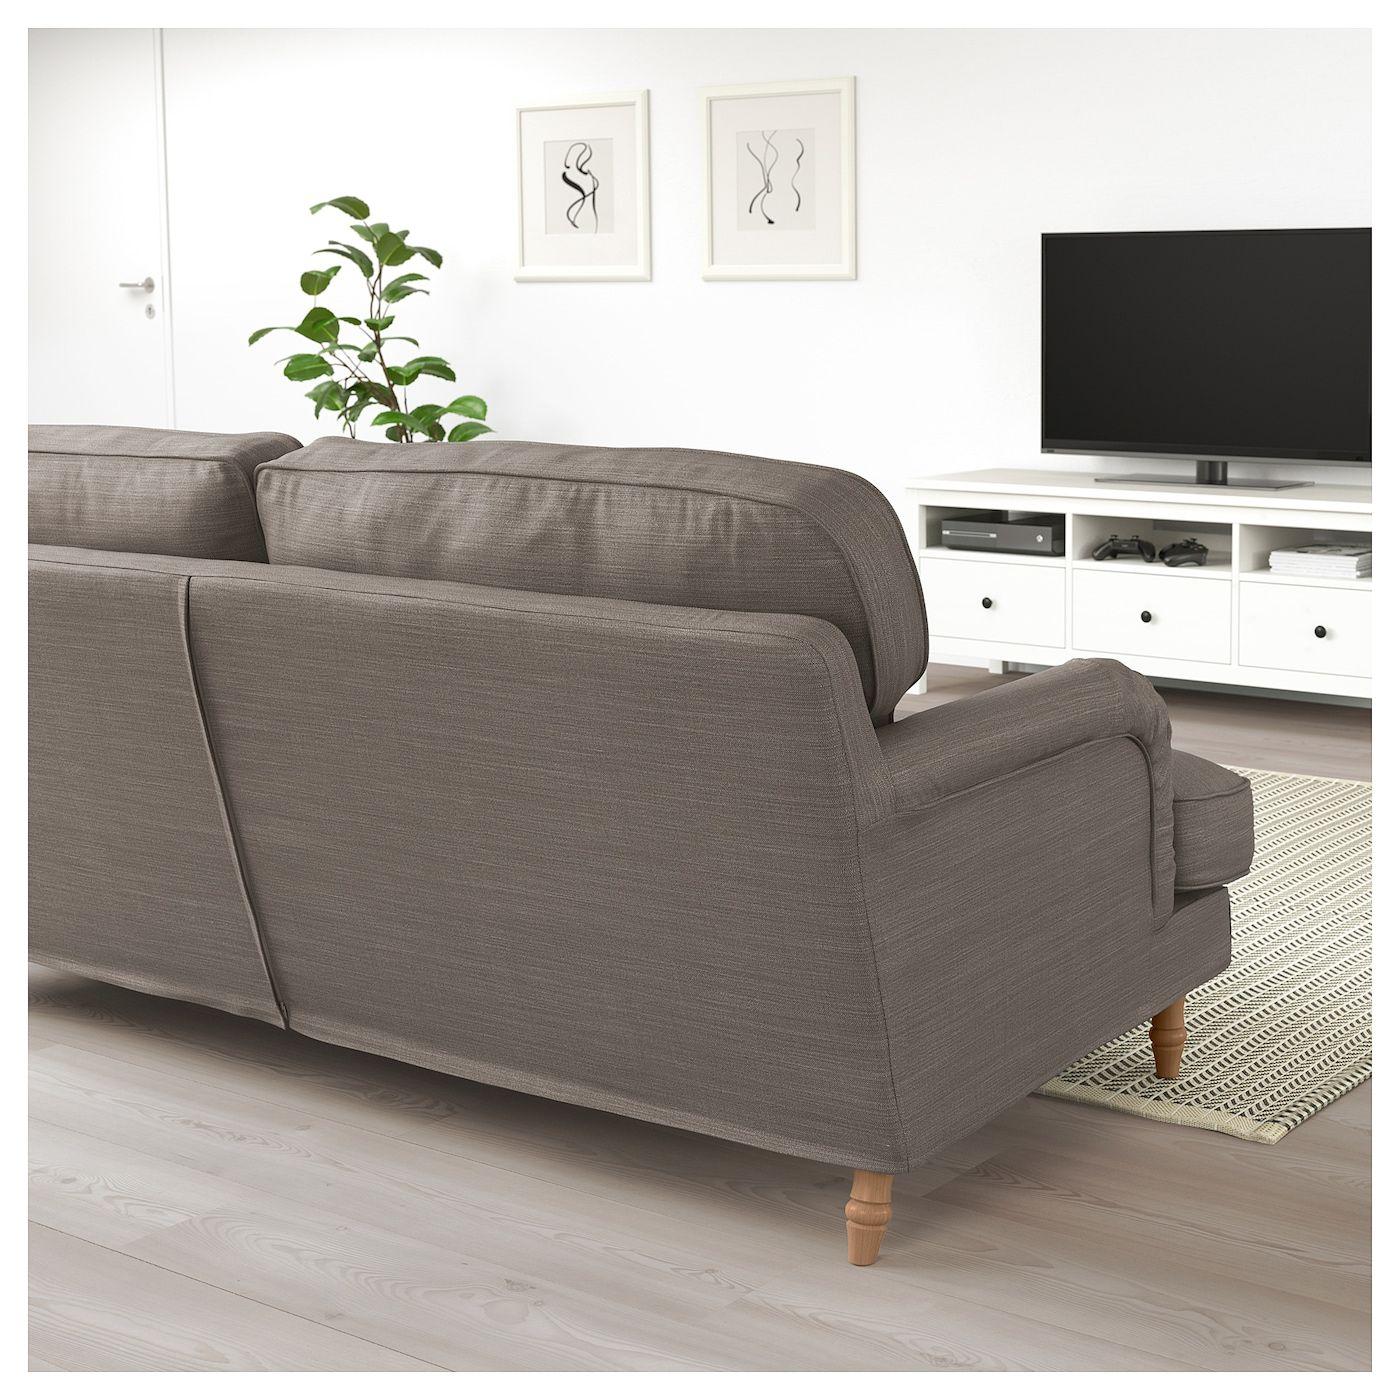 IKEA STOCKSUND Nolhaga Gray Beige